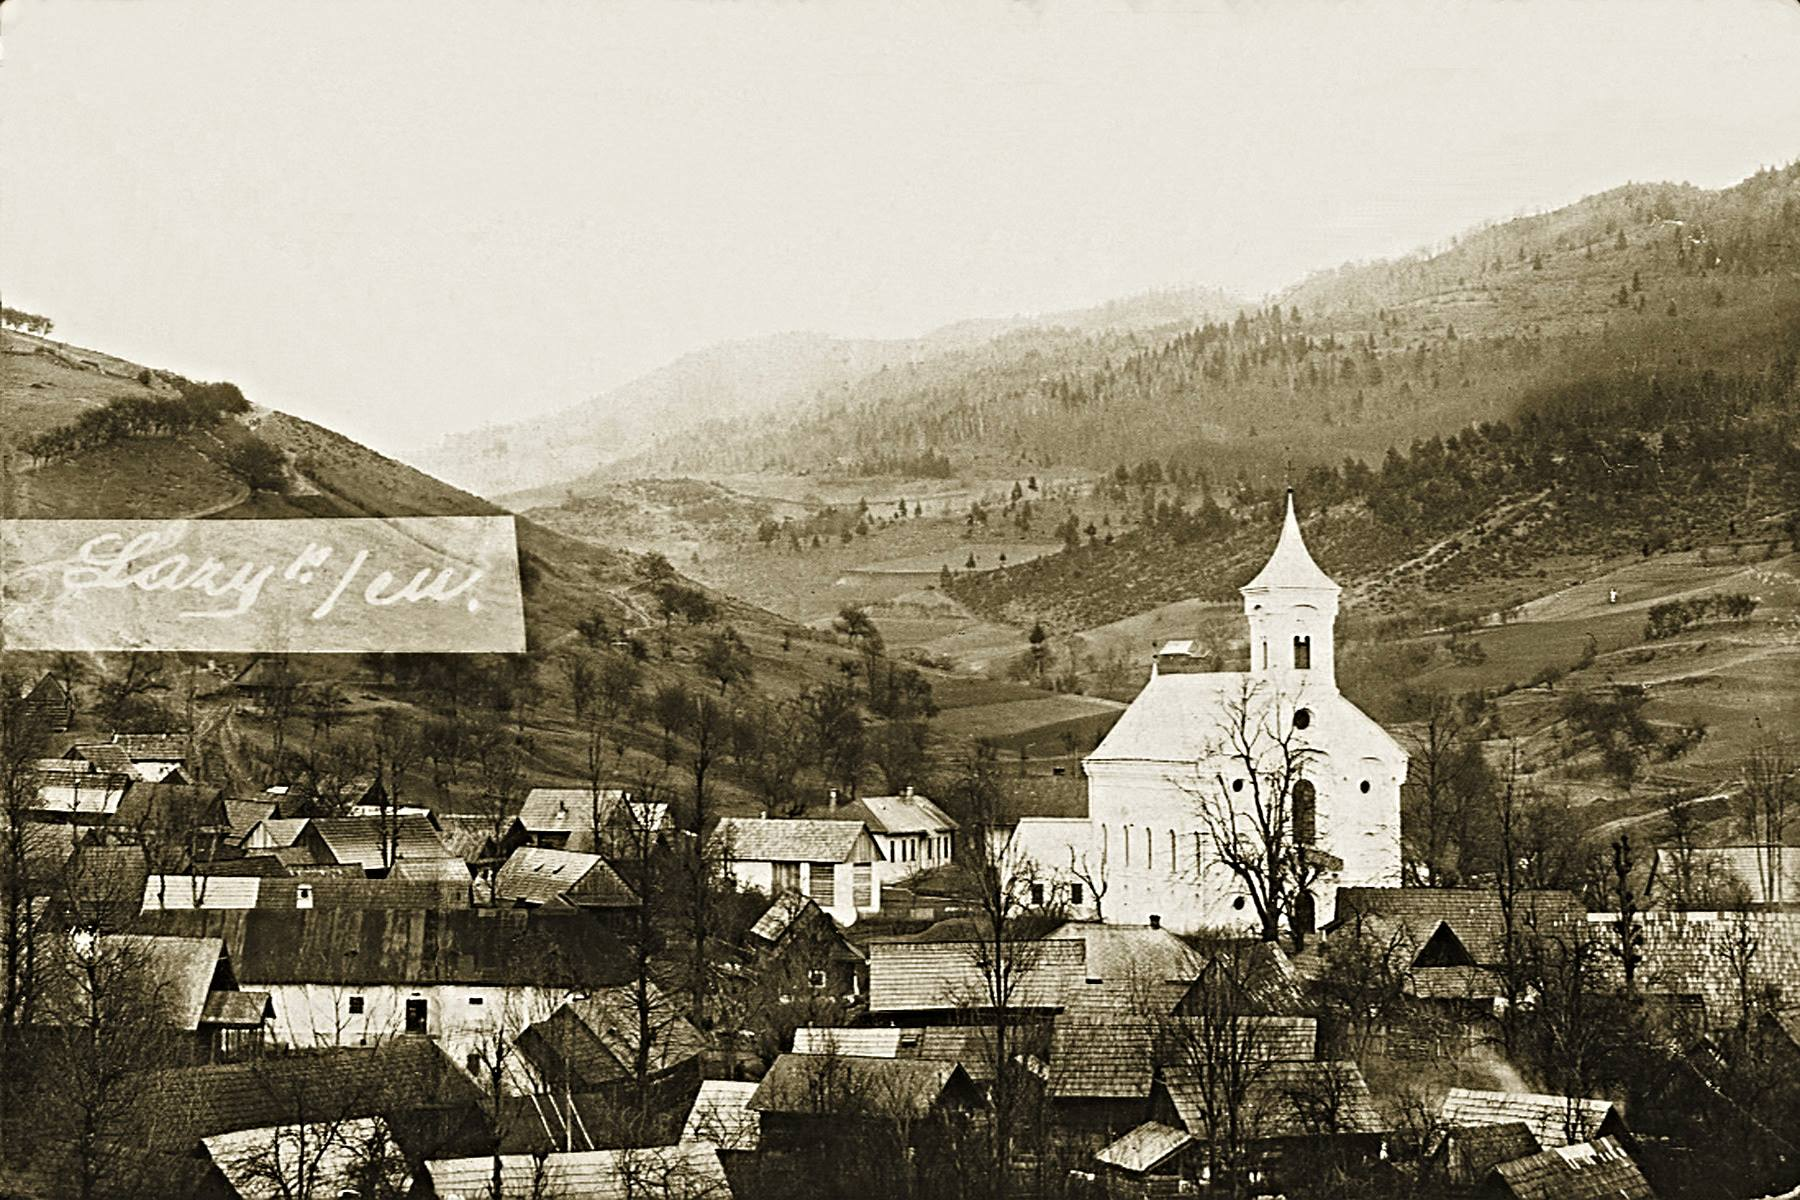 Pohľad na stred obce Lazy pod Makytou, evanjelický kostol a tzv. Potockú dolinu okolo roku 1927